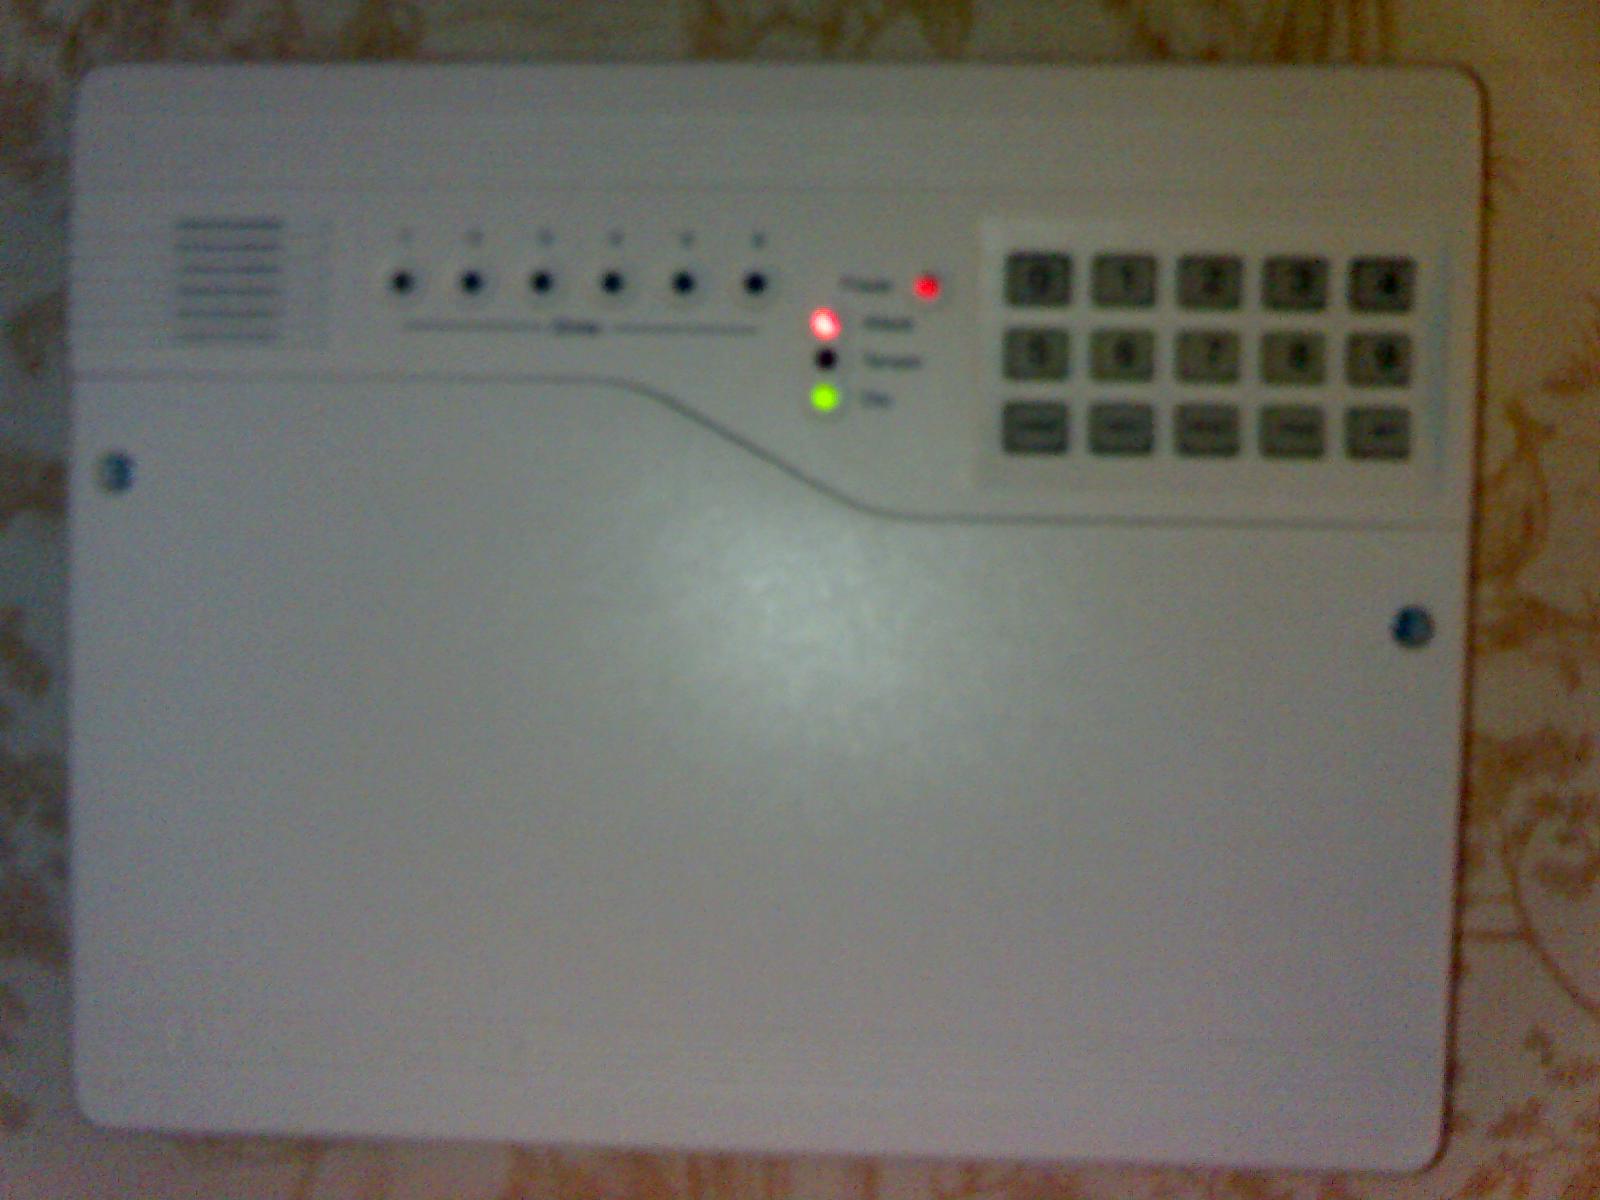 Intruder alarm: optima intruder alarm manual.